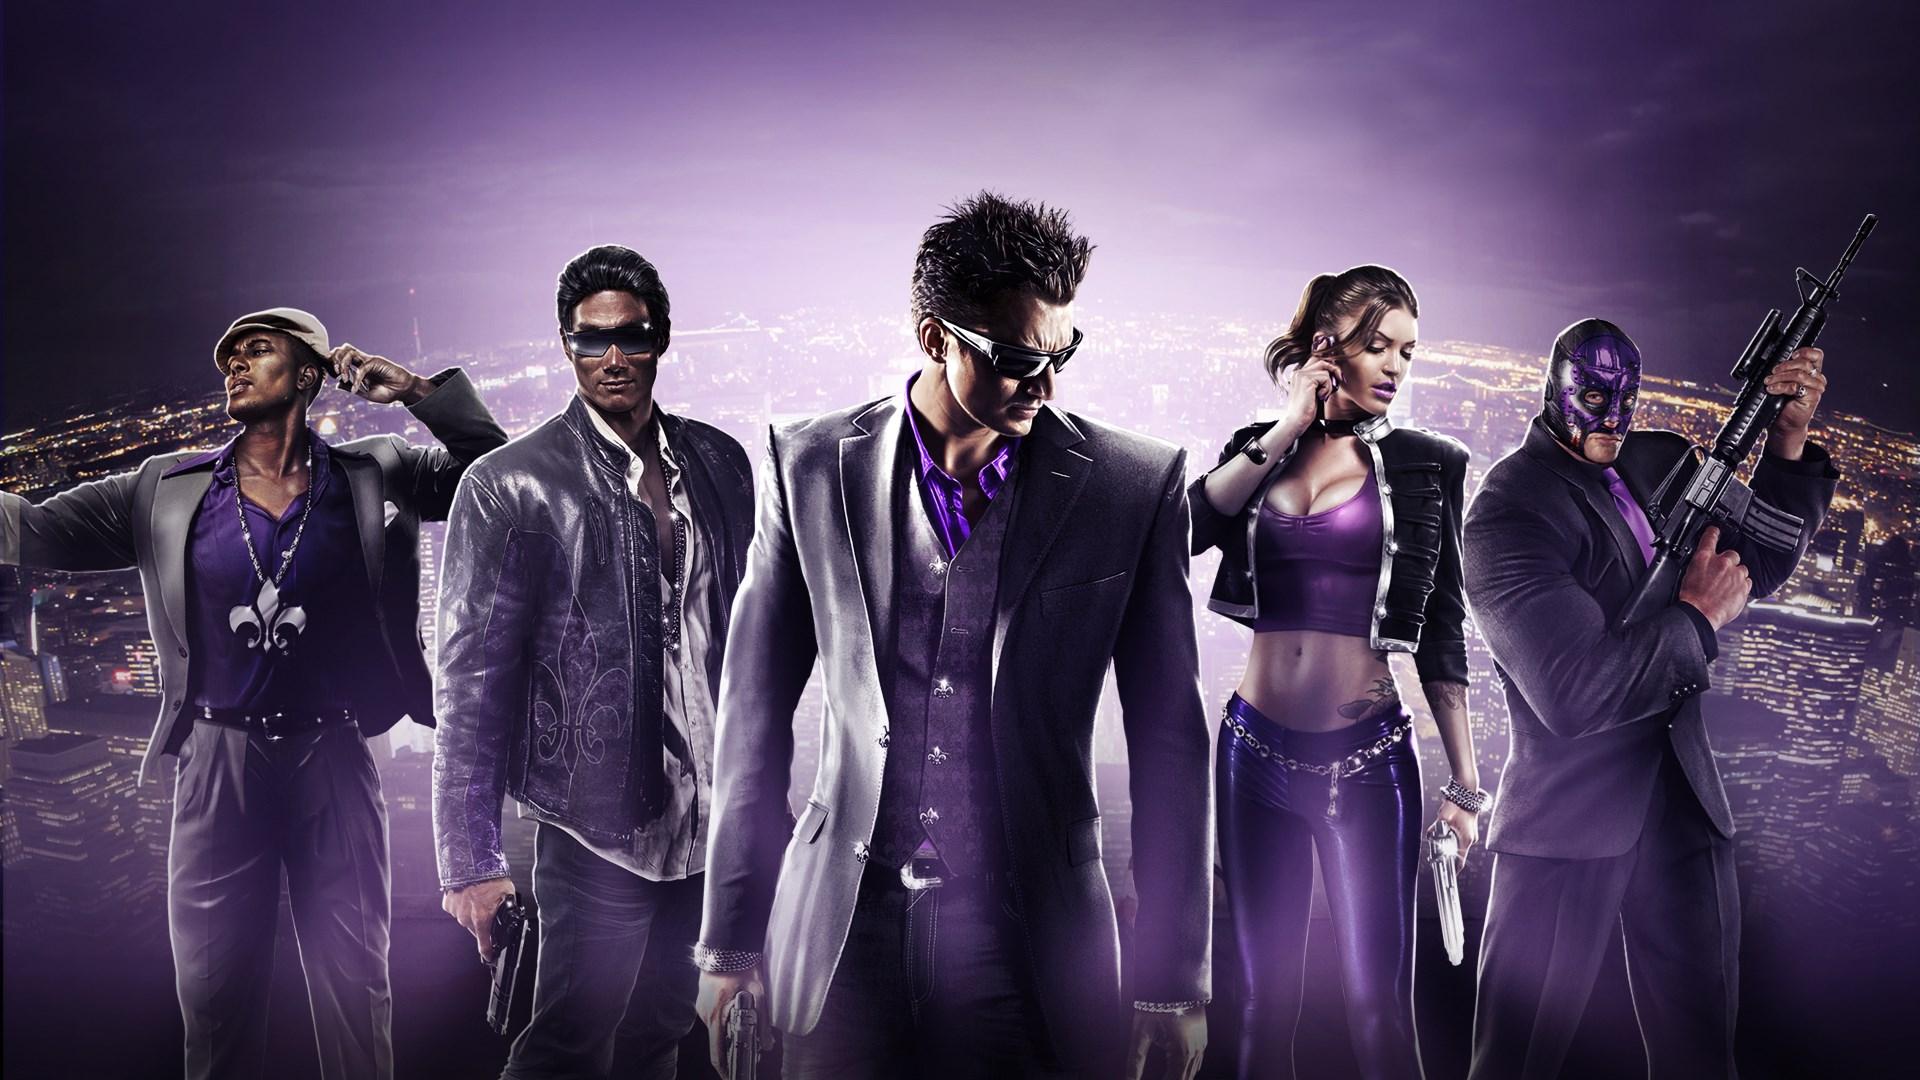 Saints Row: The Third Remastered gratis en Epic Games Store hasta septiembre 2 juegos gratis automachef